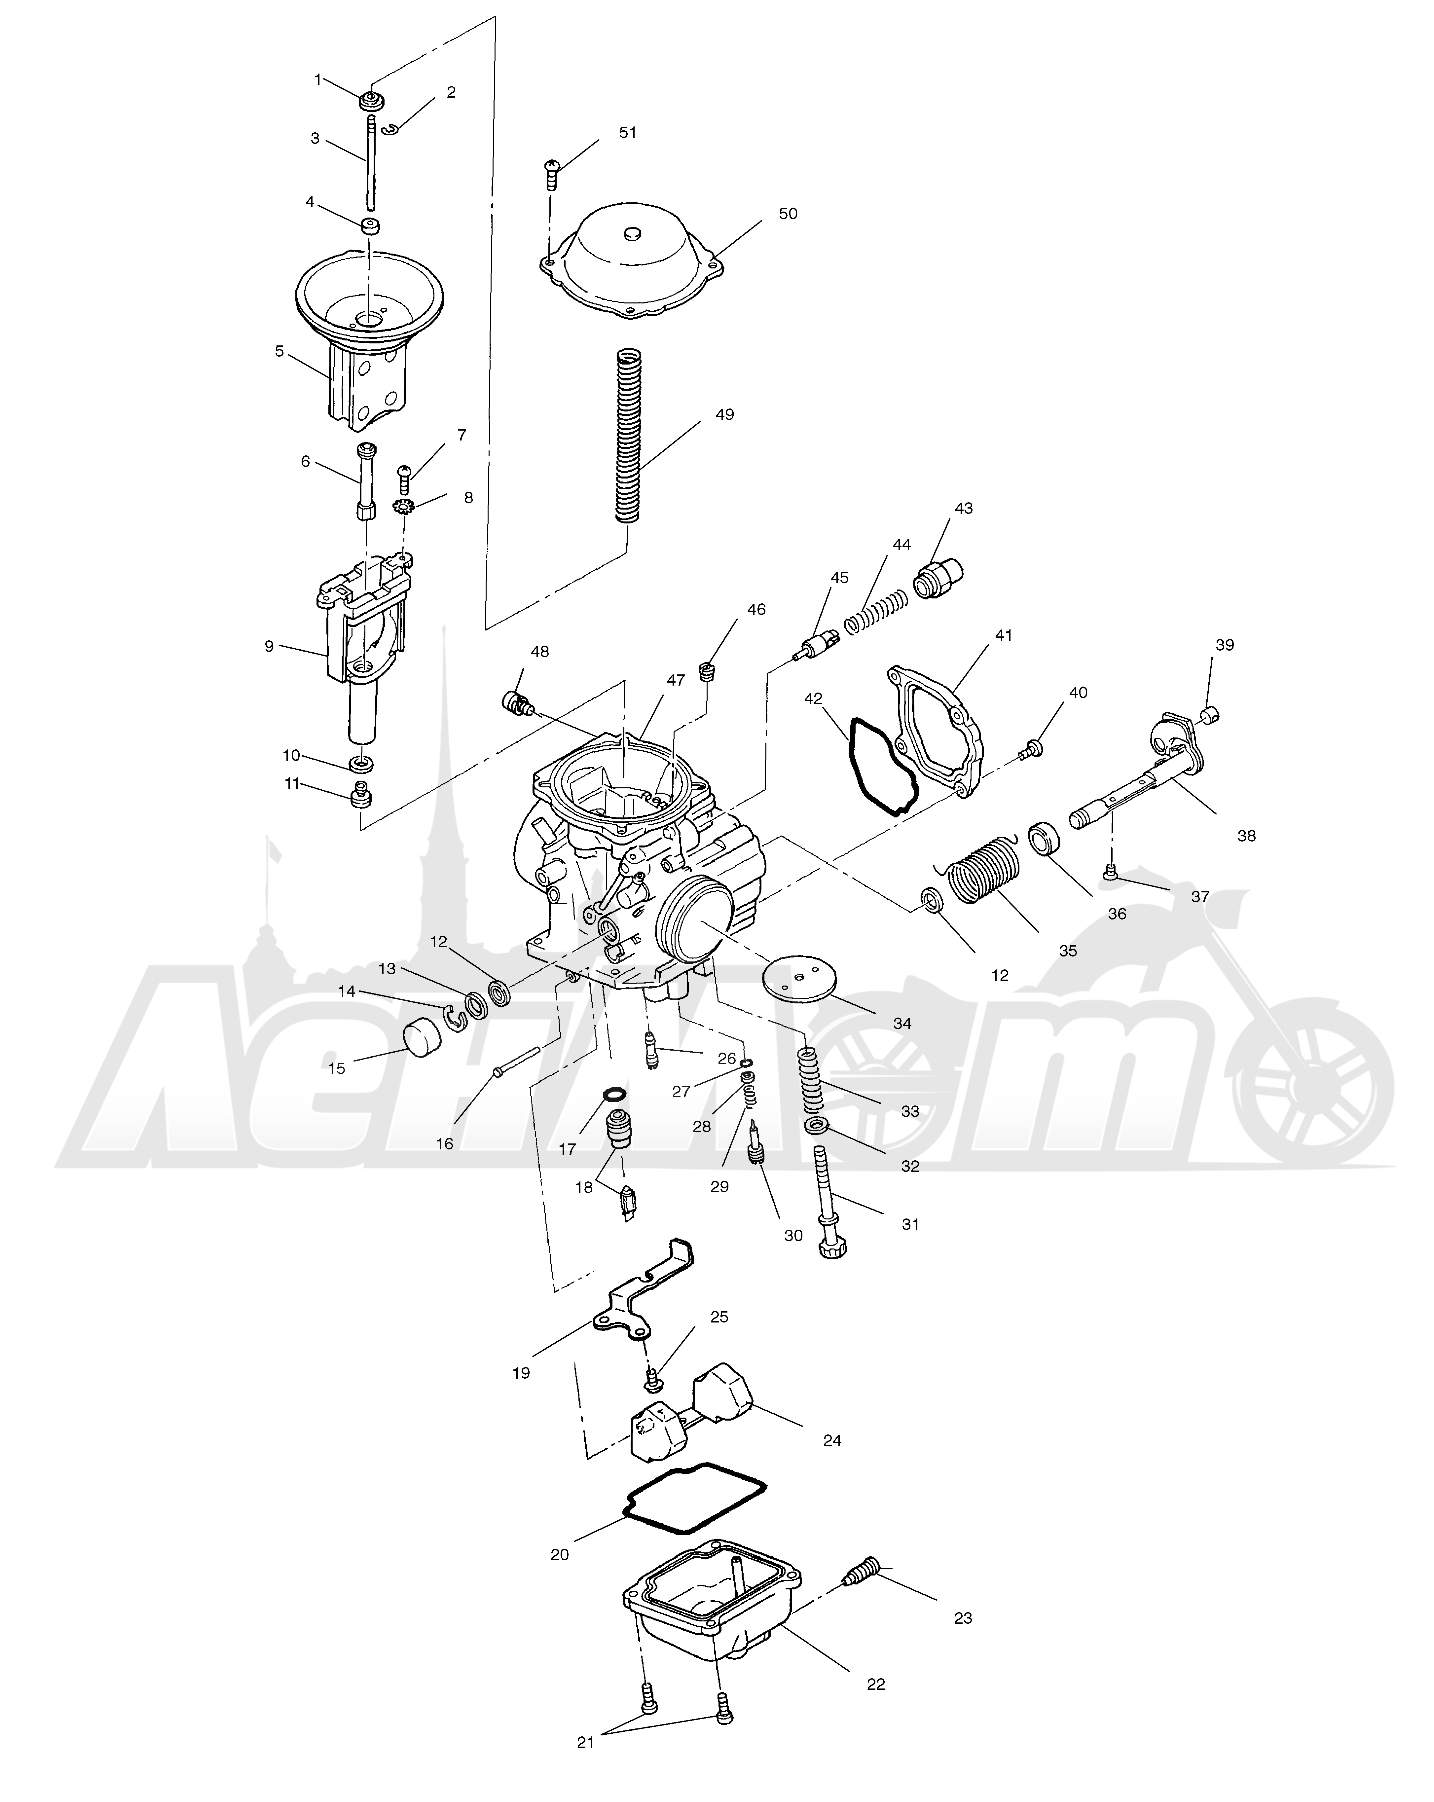 Запчасти для Квадроцикла Polaris 1997 SWEDISH SPORTSMAN 50 - S97CH50E Раздел: CARBURETOR - W97CH50A | карбюратор W97CH50A